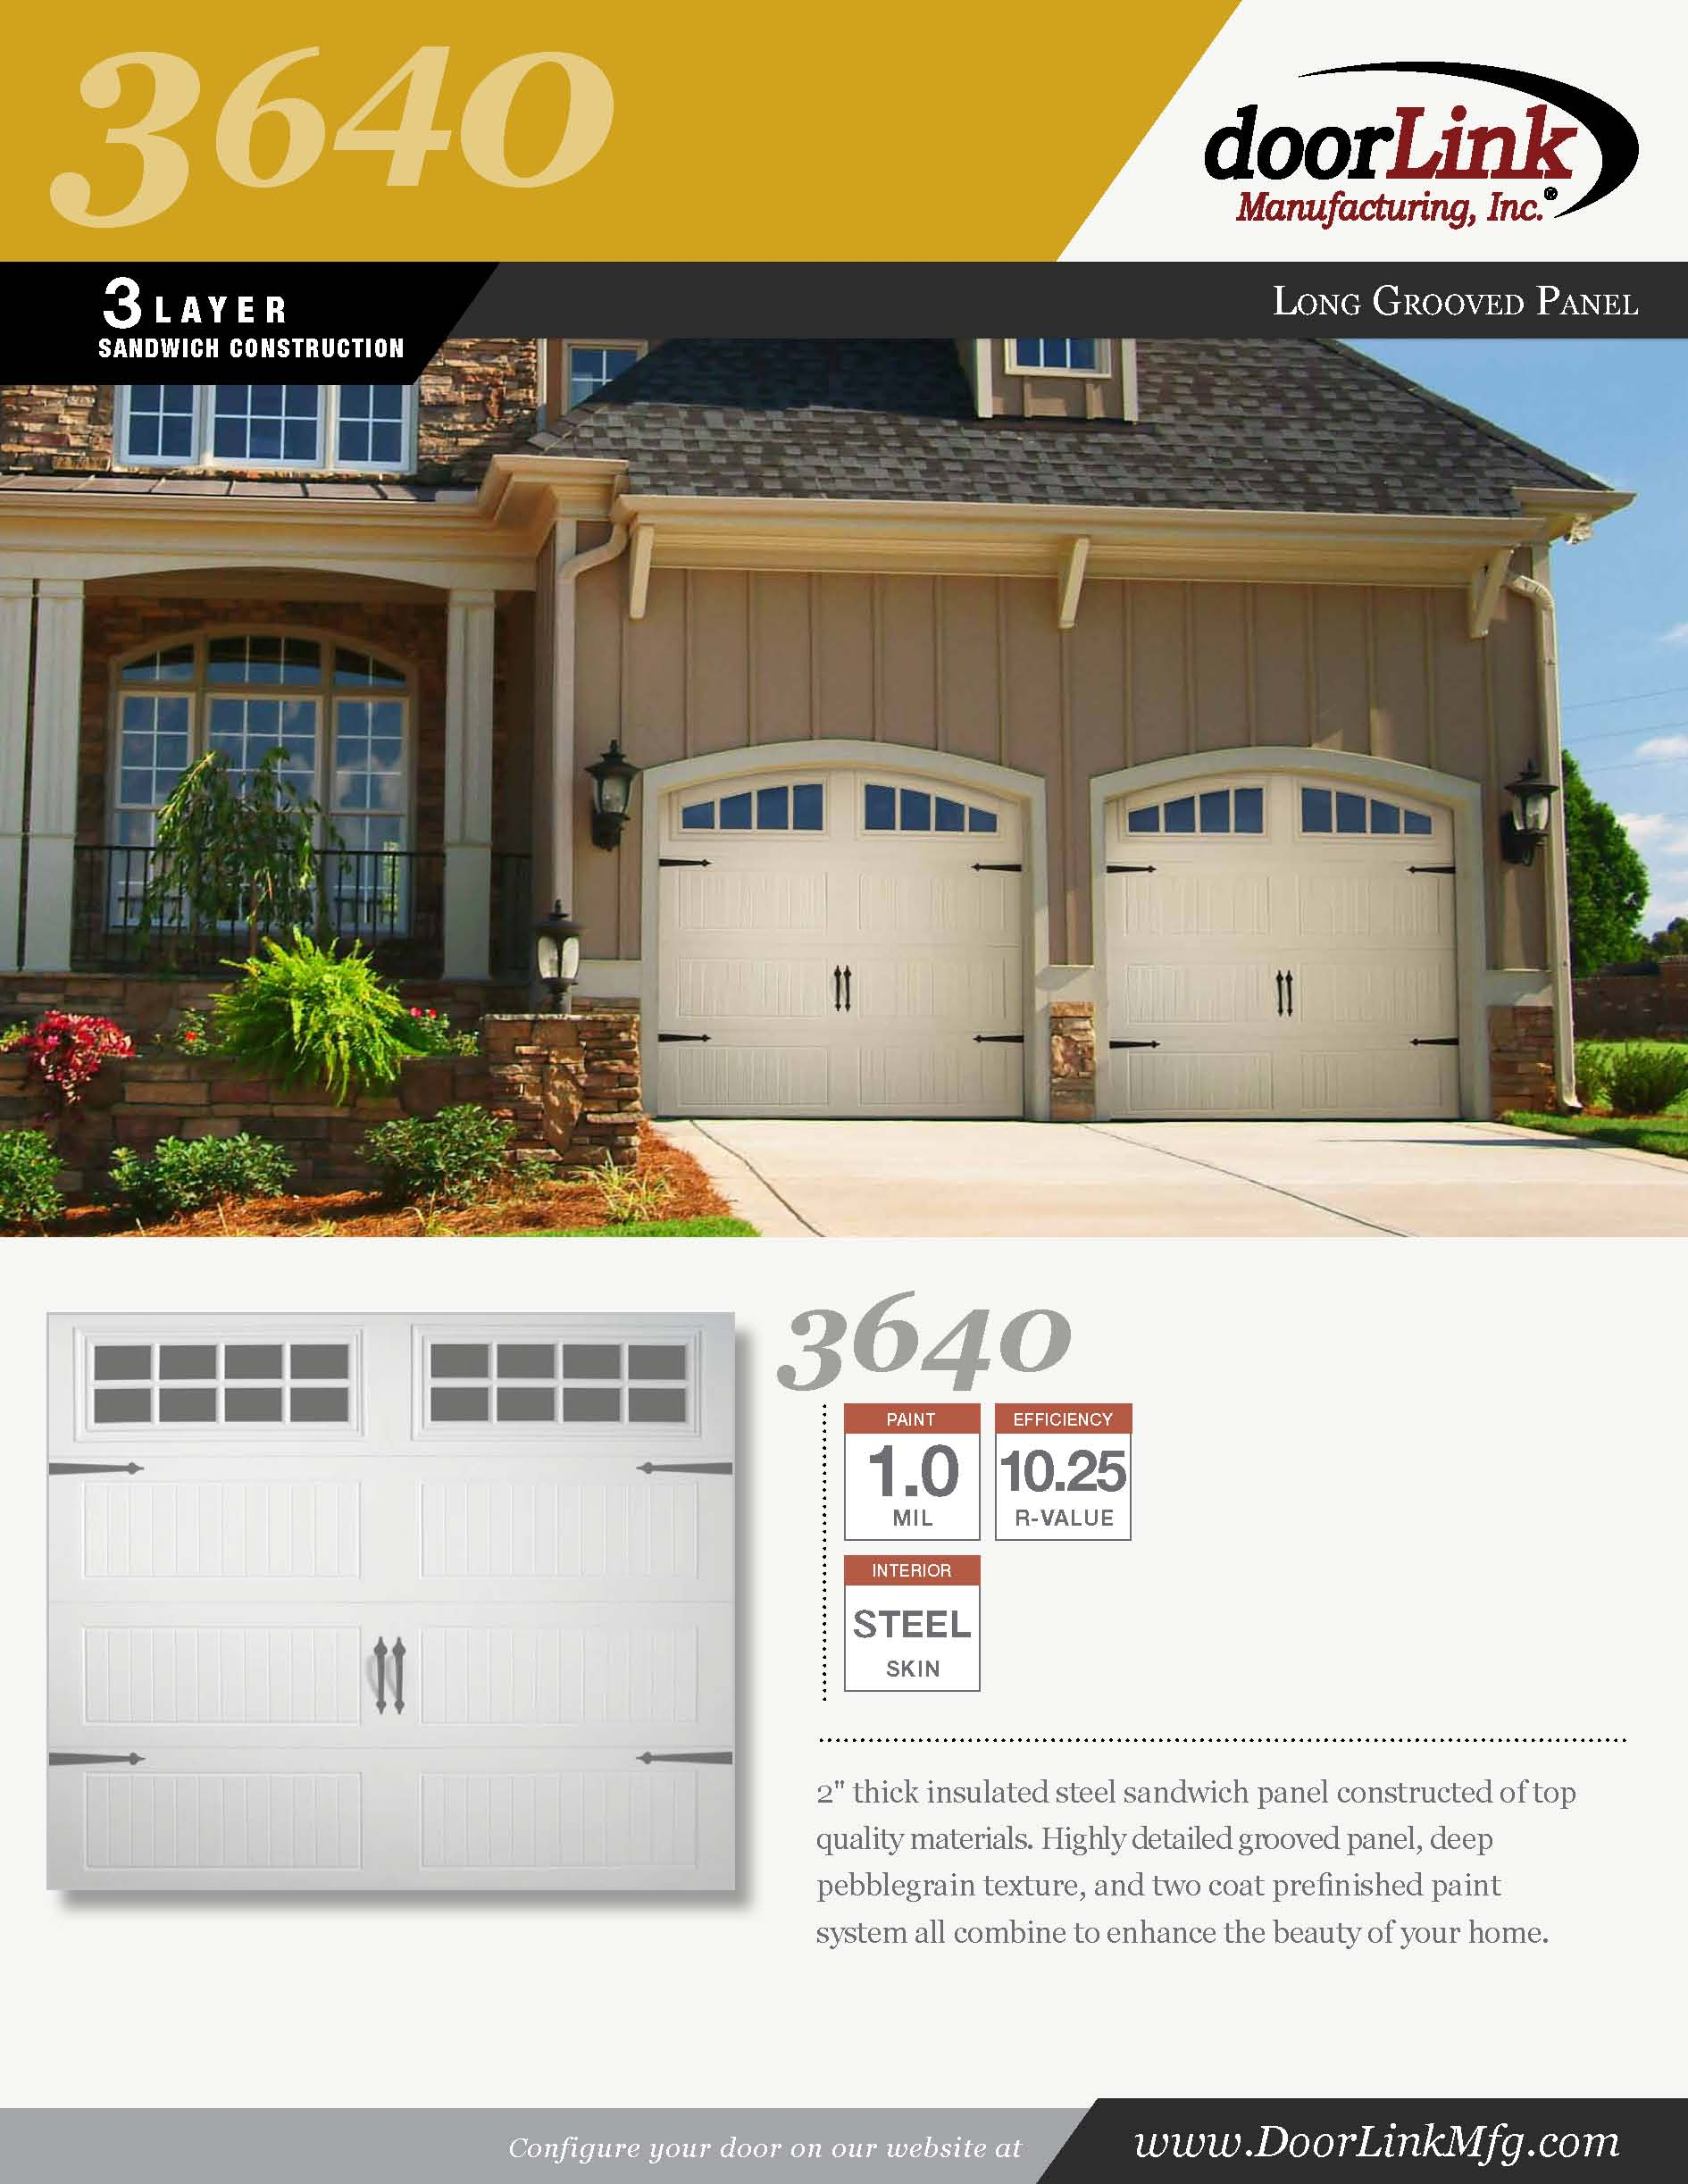 Doorlink-Brochure_Car-house-3640_Page_1